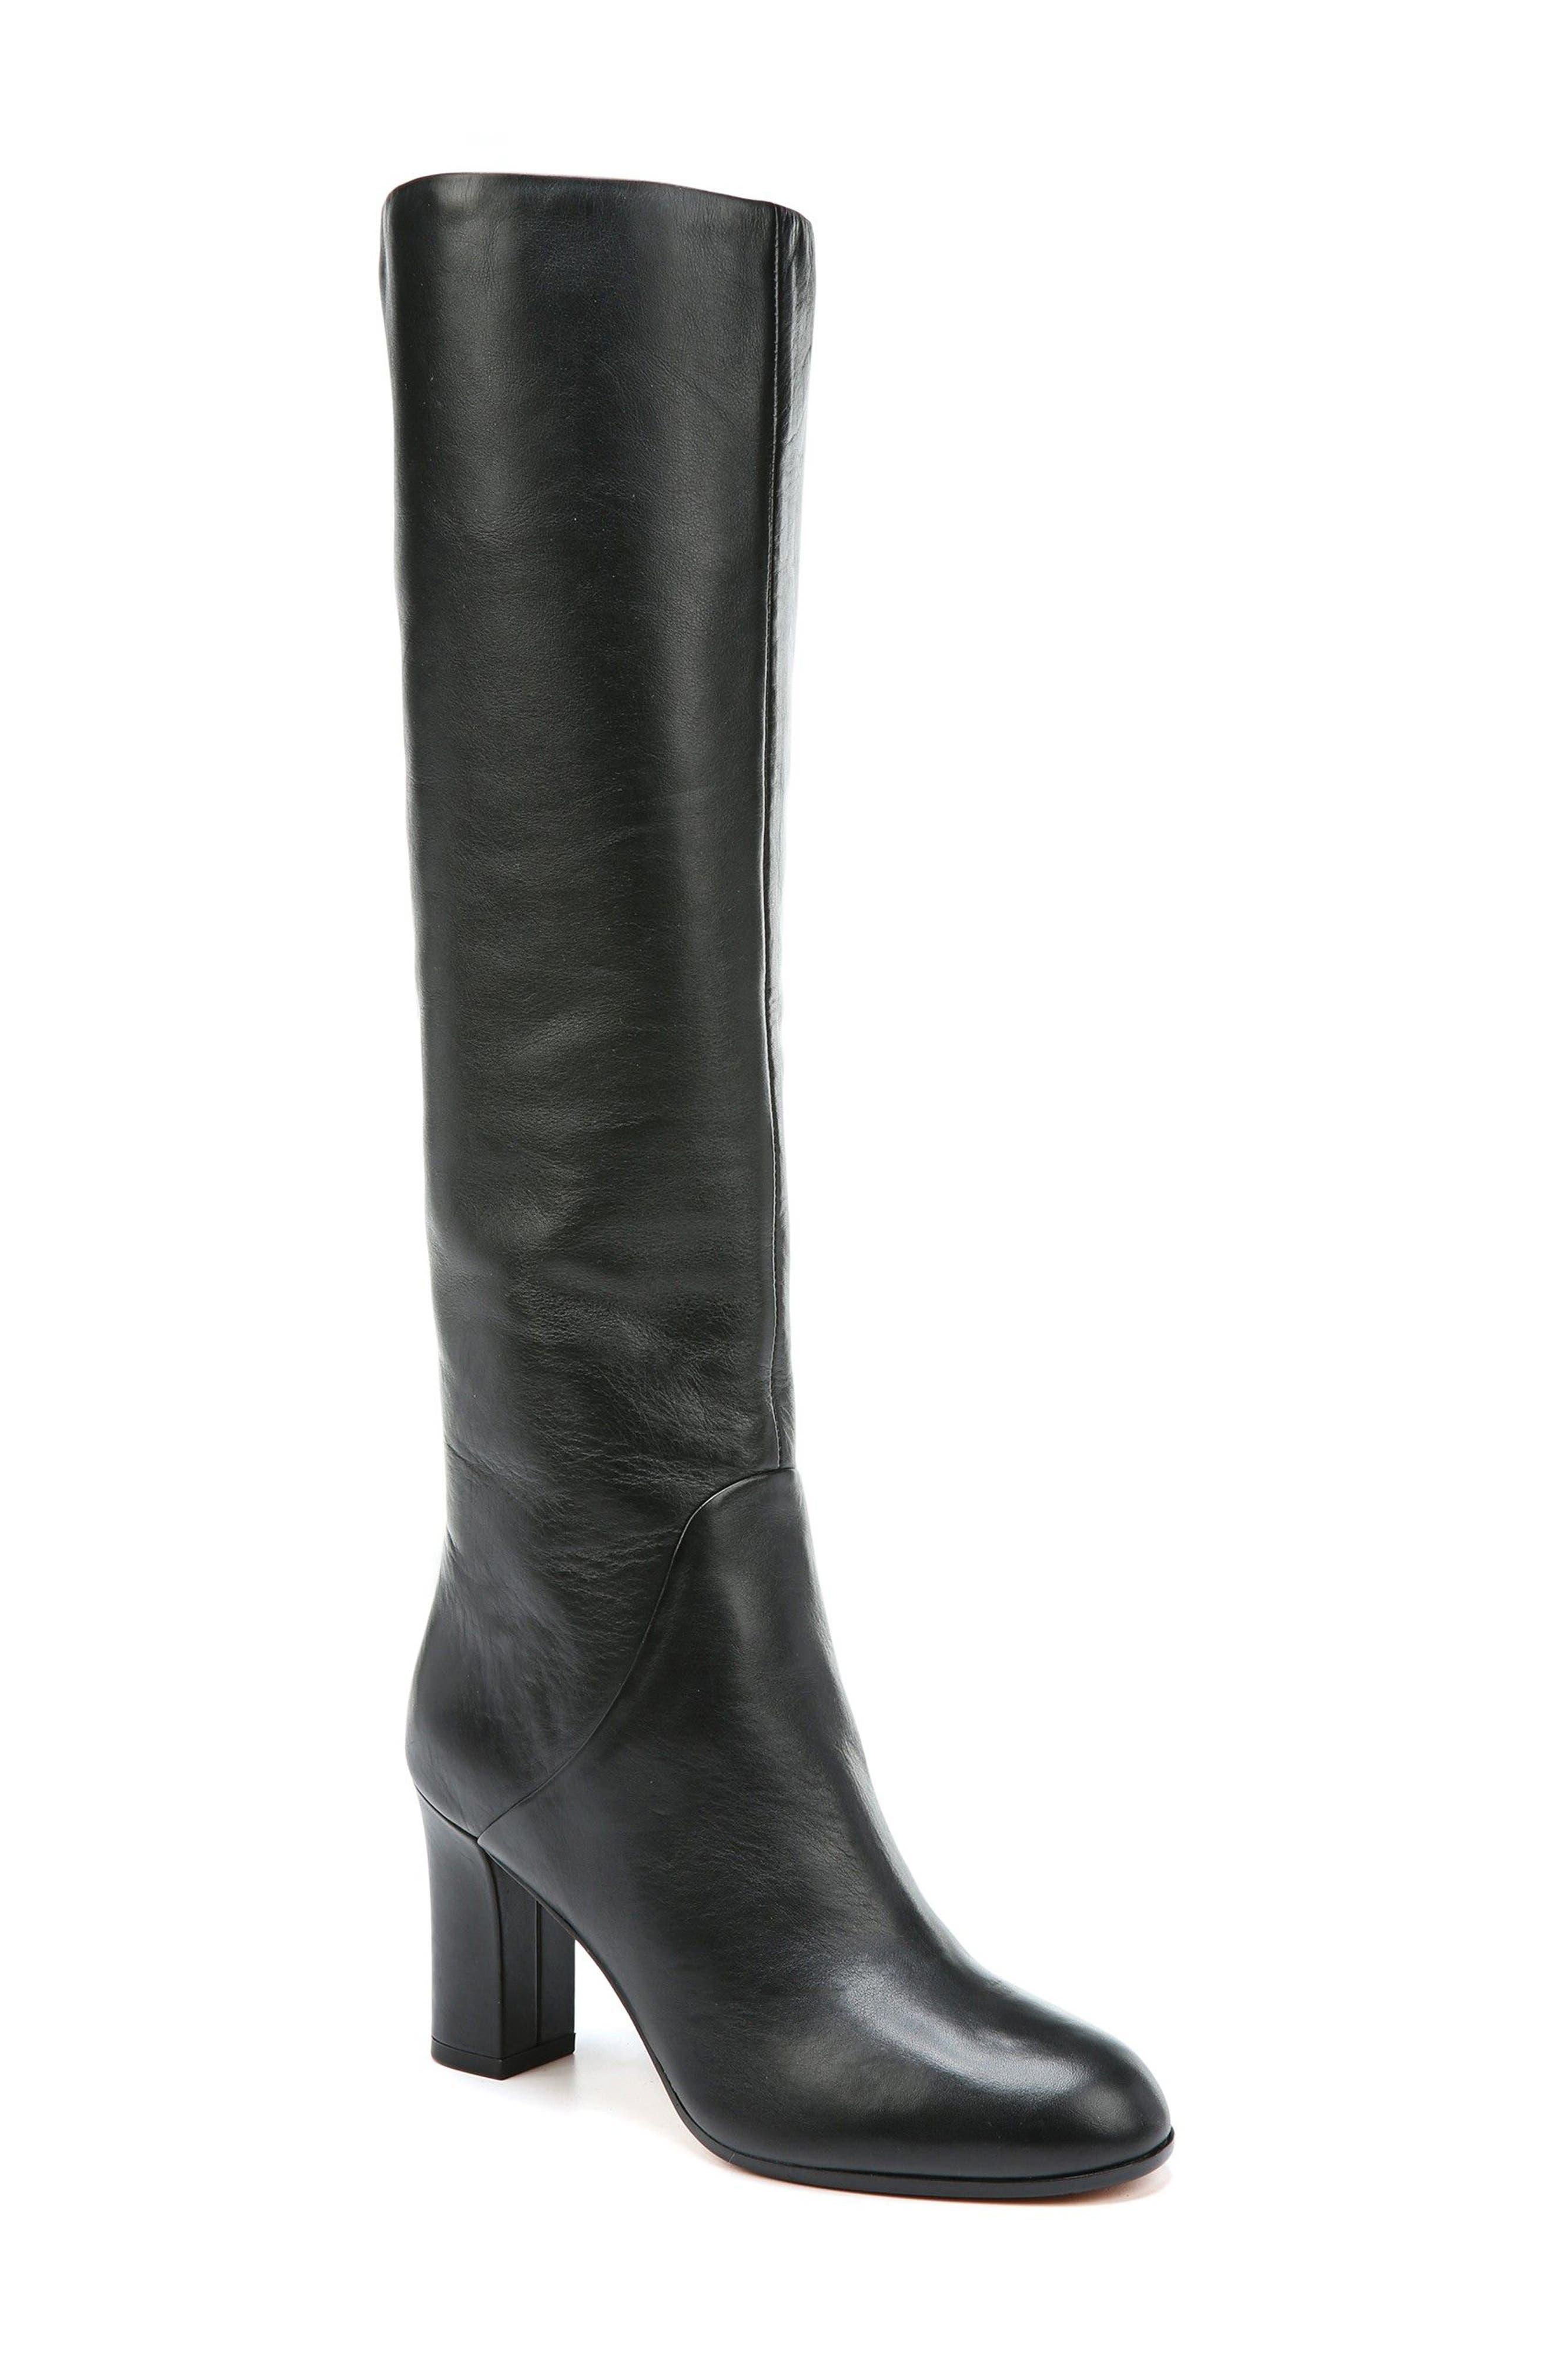 Soho Knee High Boot,                             Main thumbnail 1, color,                             Onyx Leather